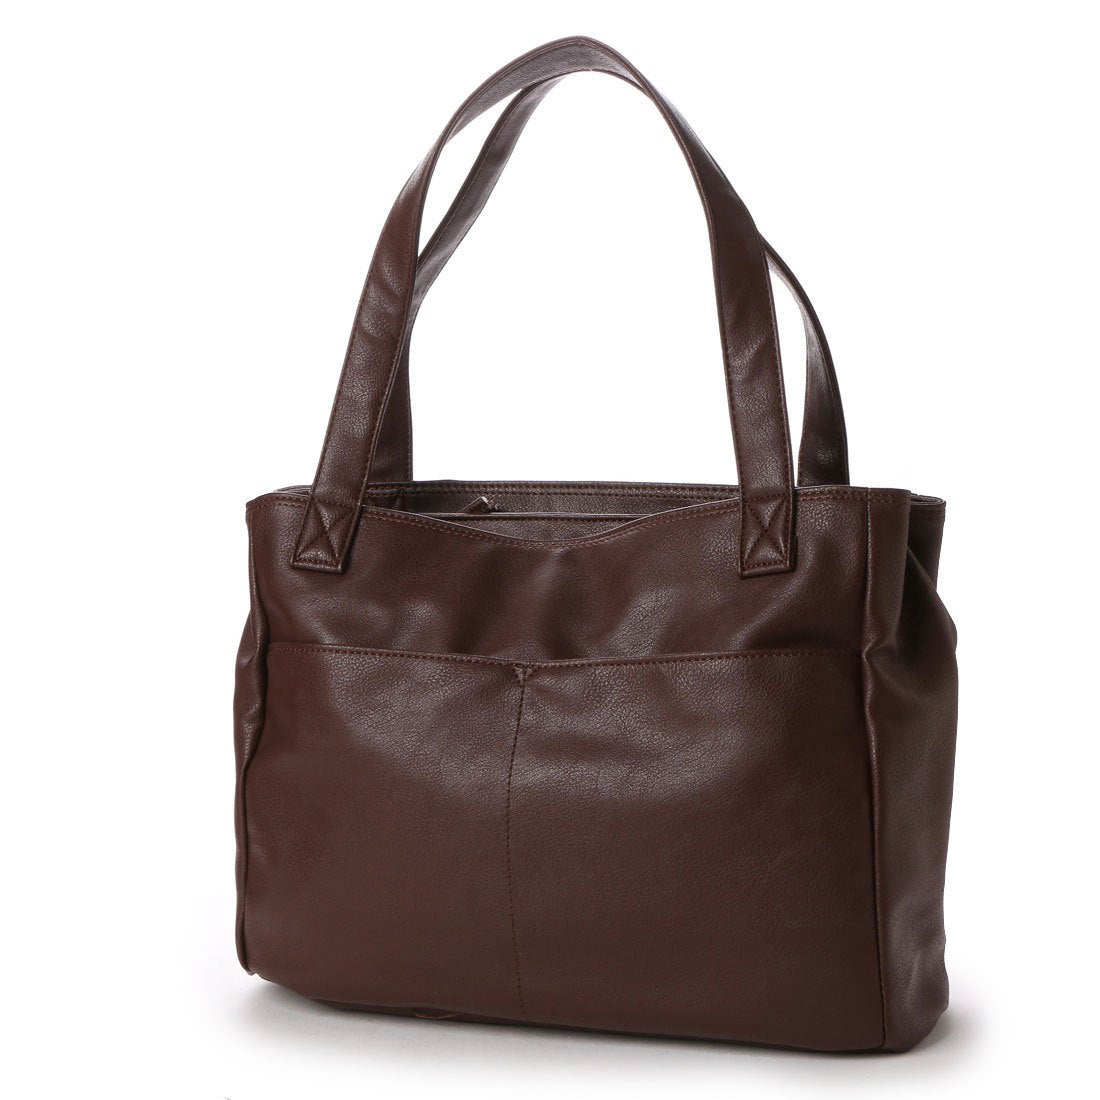 【SALE 8%OFF】ラナサックス Rana Sacs Rana Sacs A4対応2層式合皮トートバッグ (コゲチャ) レディース